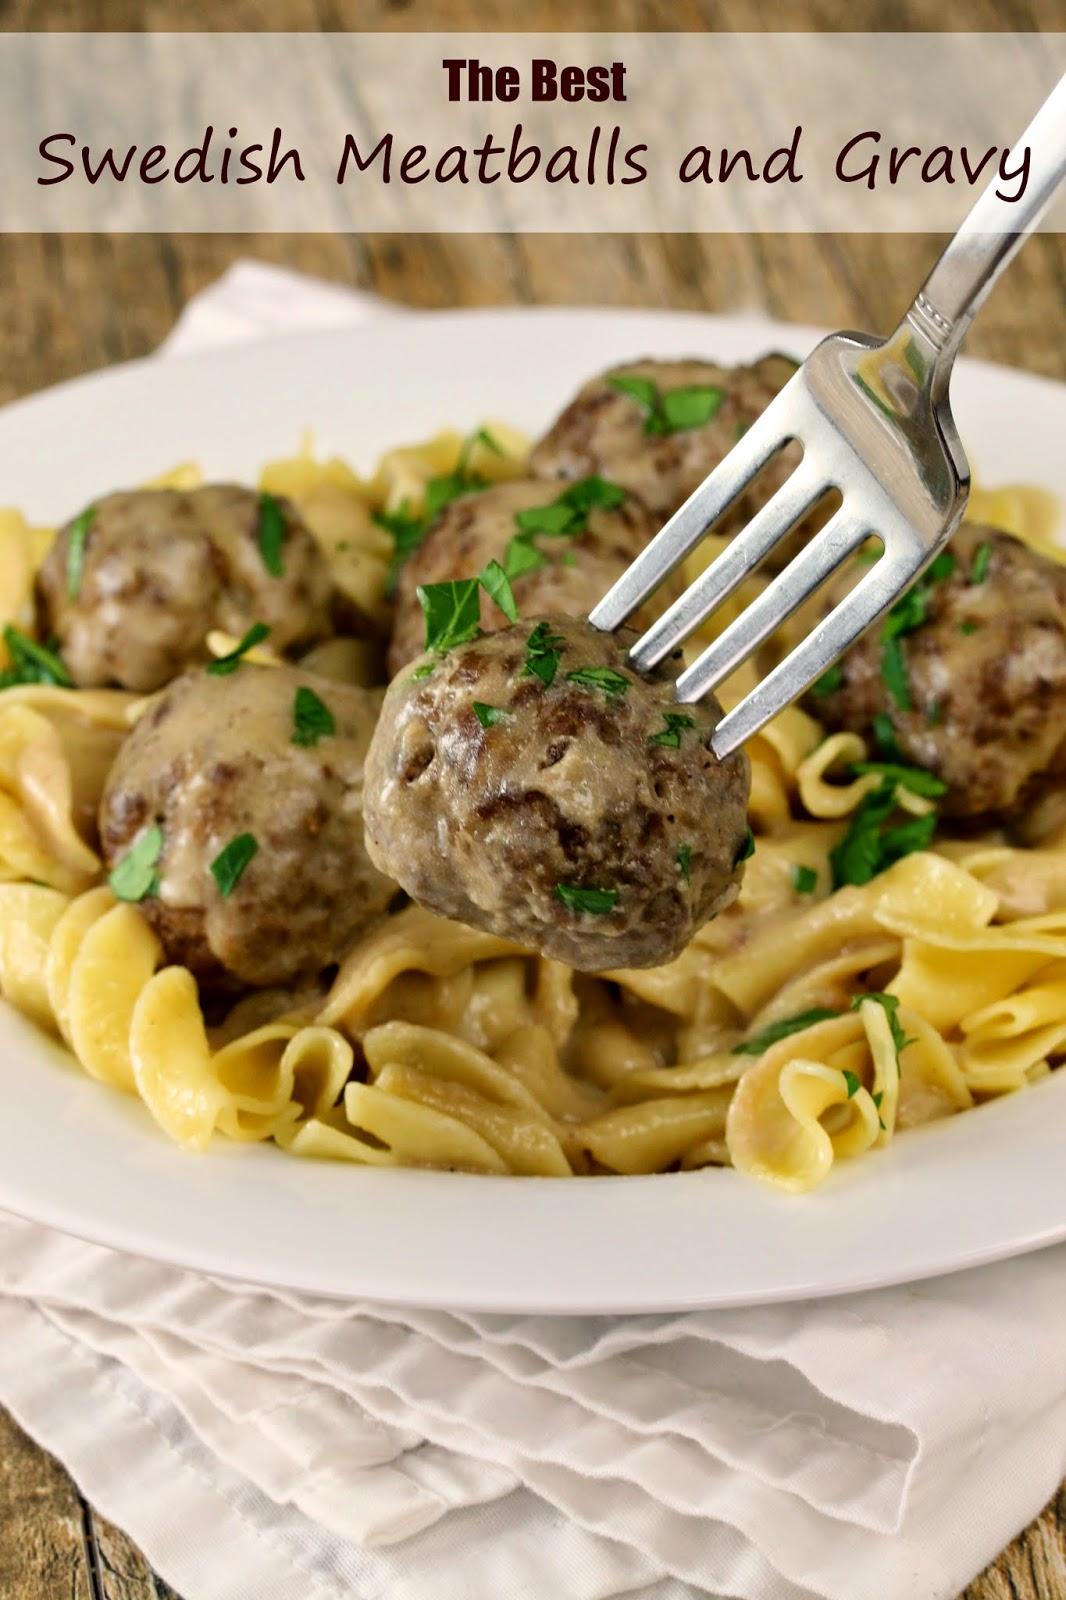 The Best Swedish Meatballs And Gravy